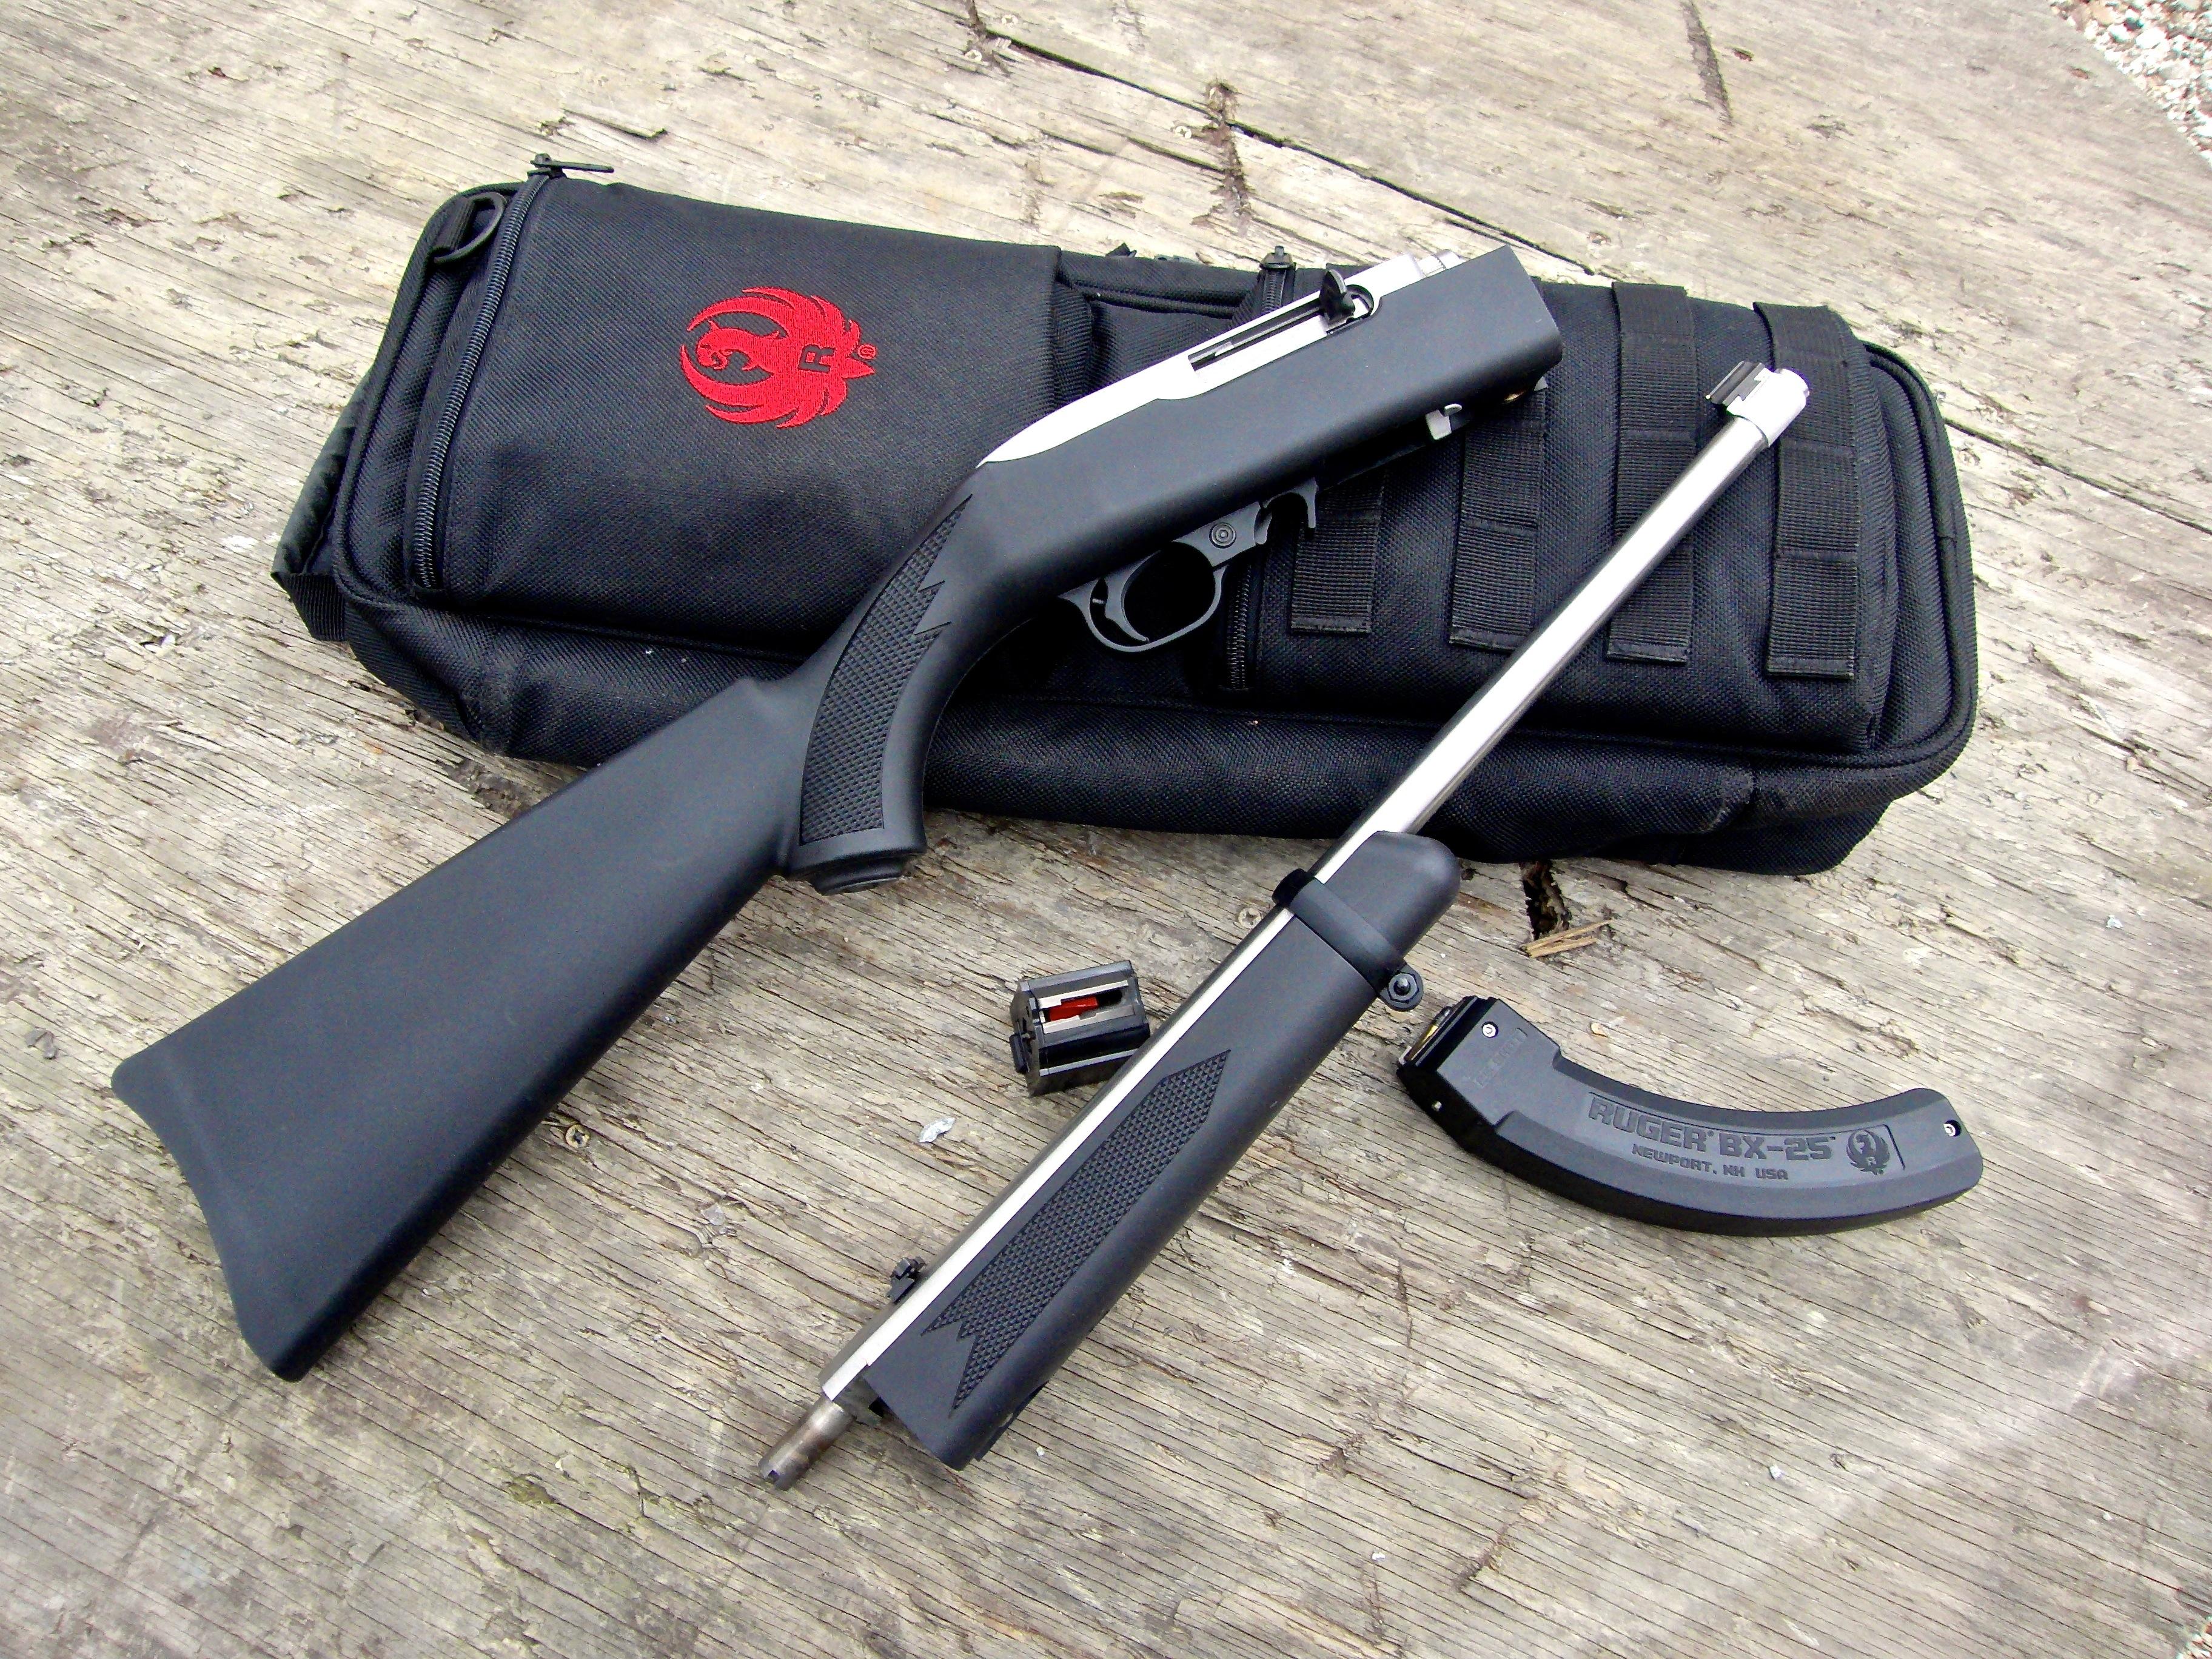 Long Guns: Ruger 10/22 Takedown Rifle | S.W.A.T. Magazine